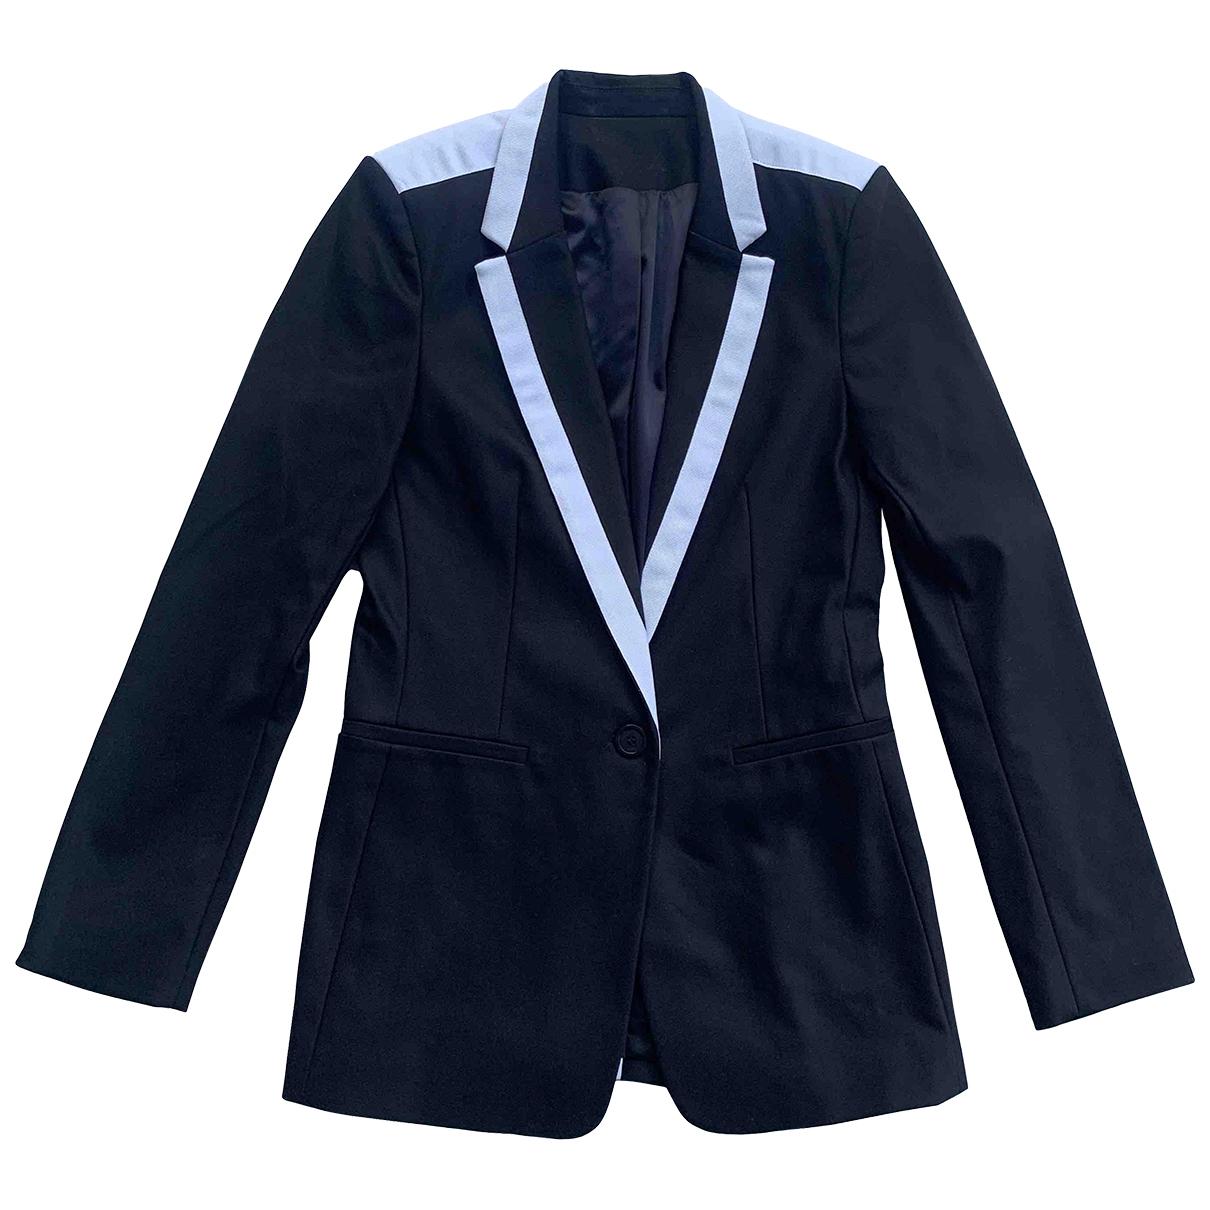 Karl Lagerfeld N Black Cotton jacket for Women 40 FR